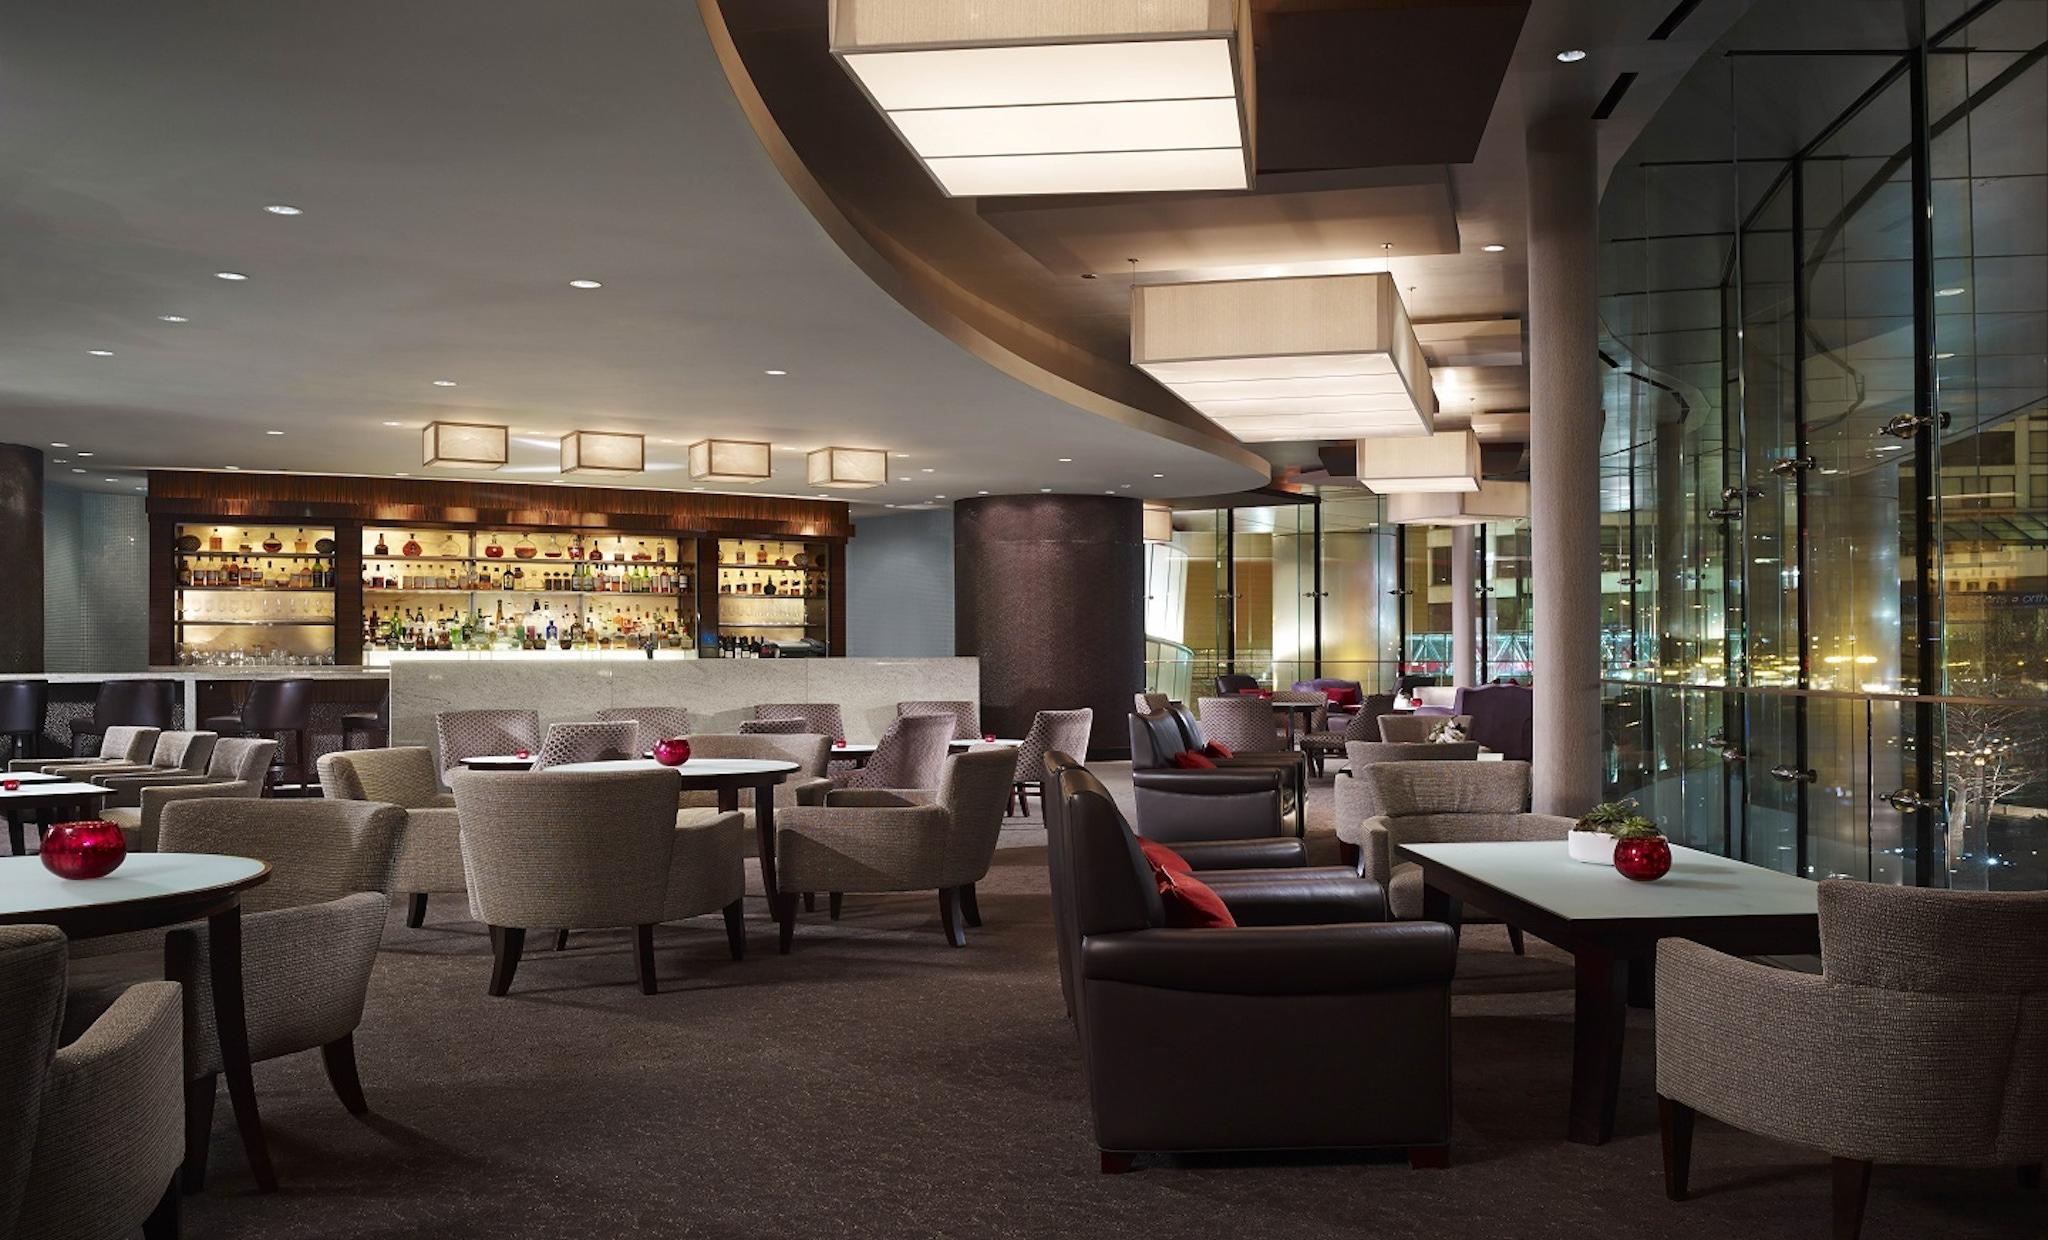 Rebar at Trump International Hotel & Tower